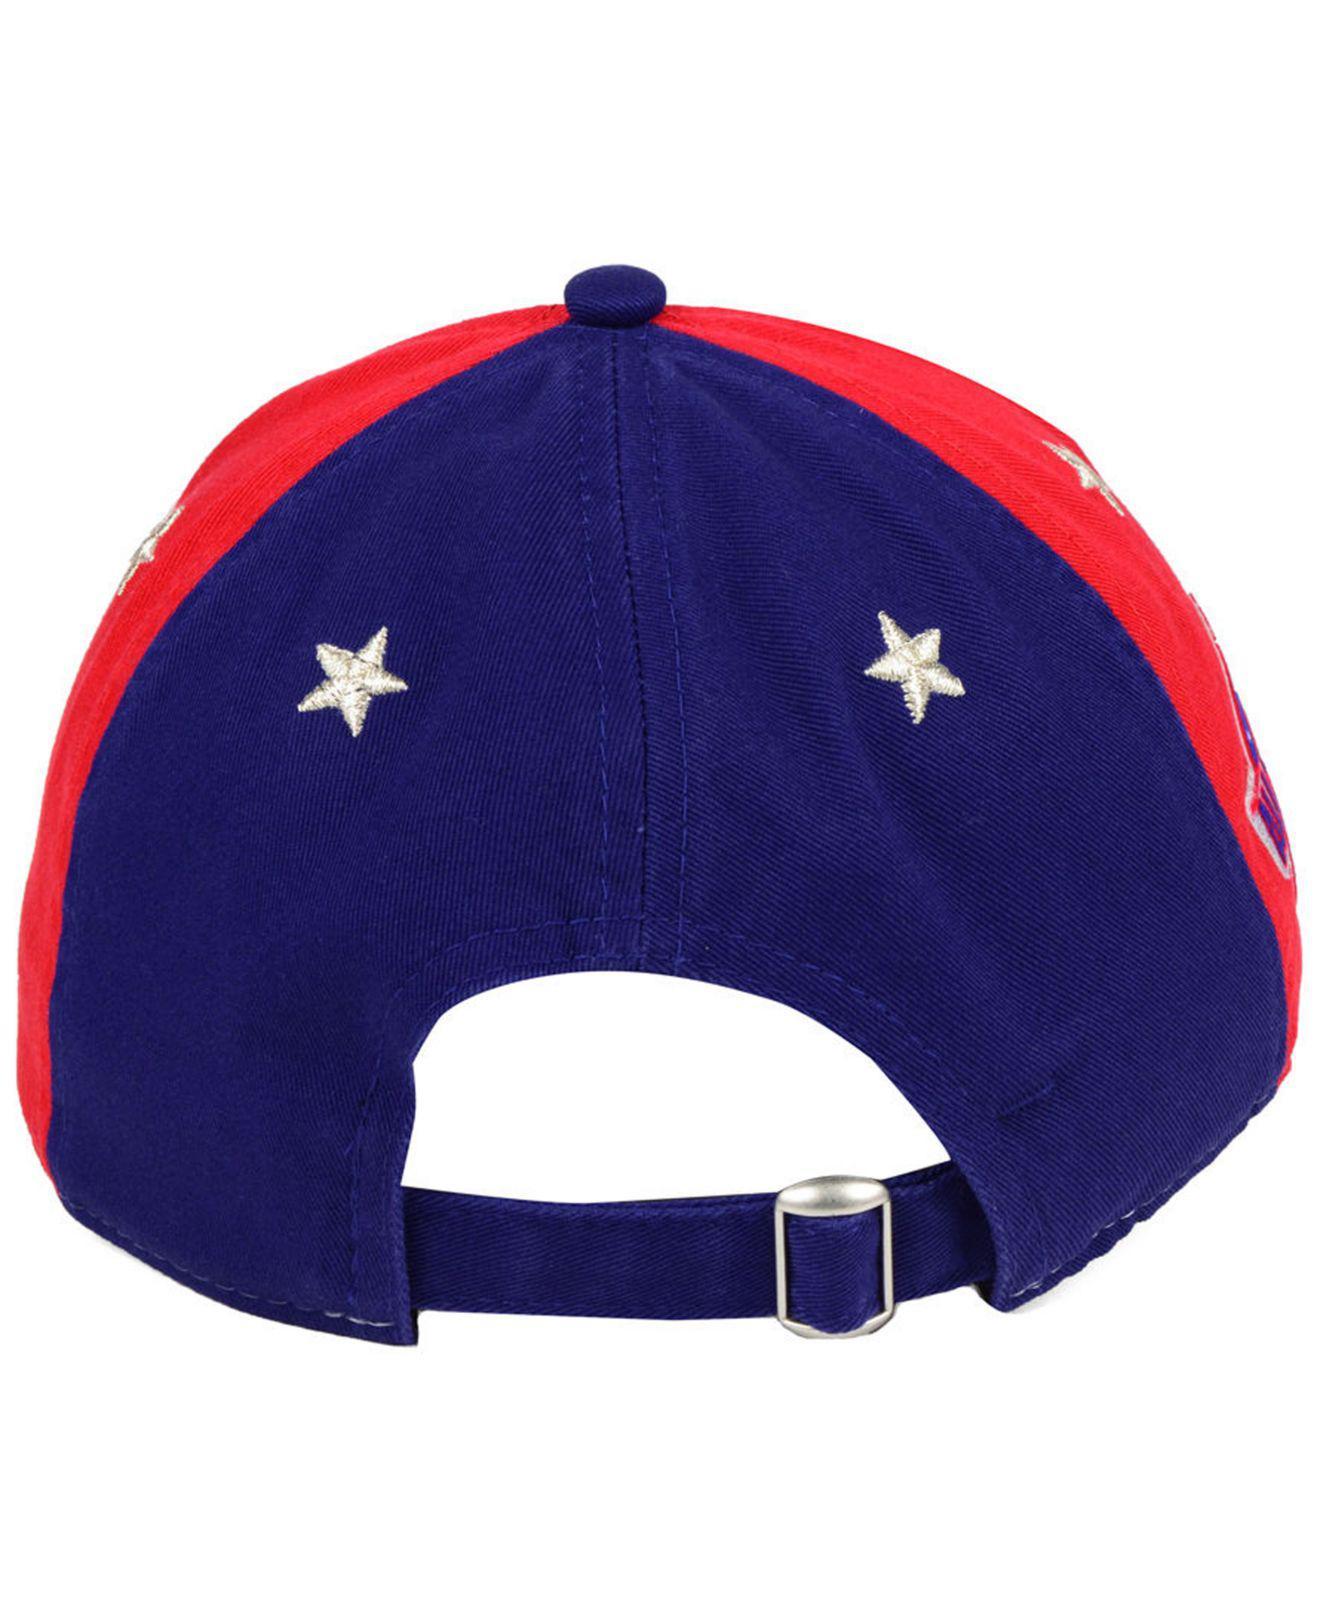 low priced ceee9 1c839 ... promo code for philadelphia phillies all star game 9twenty strapback cap  2018 for men lyst.